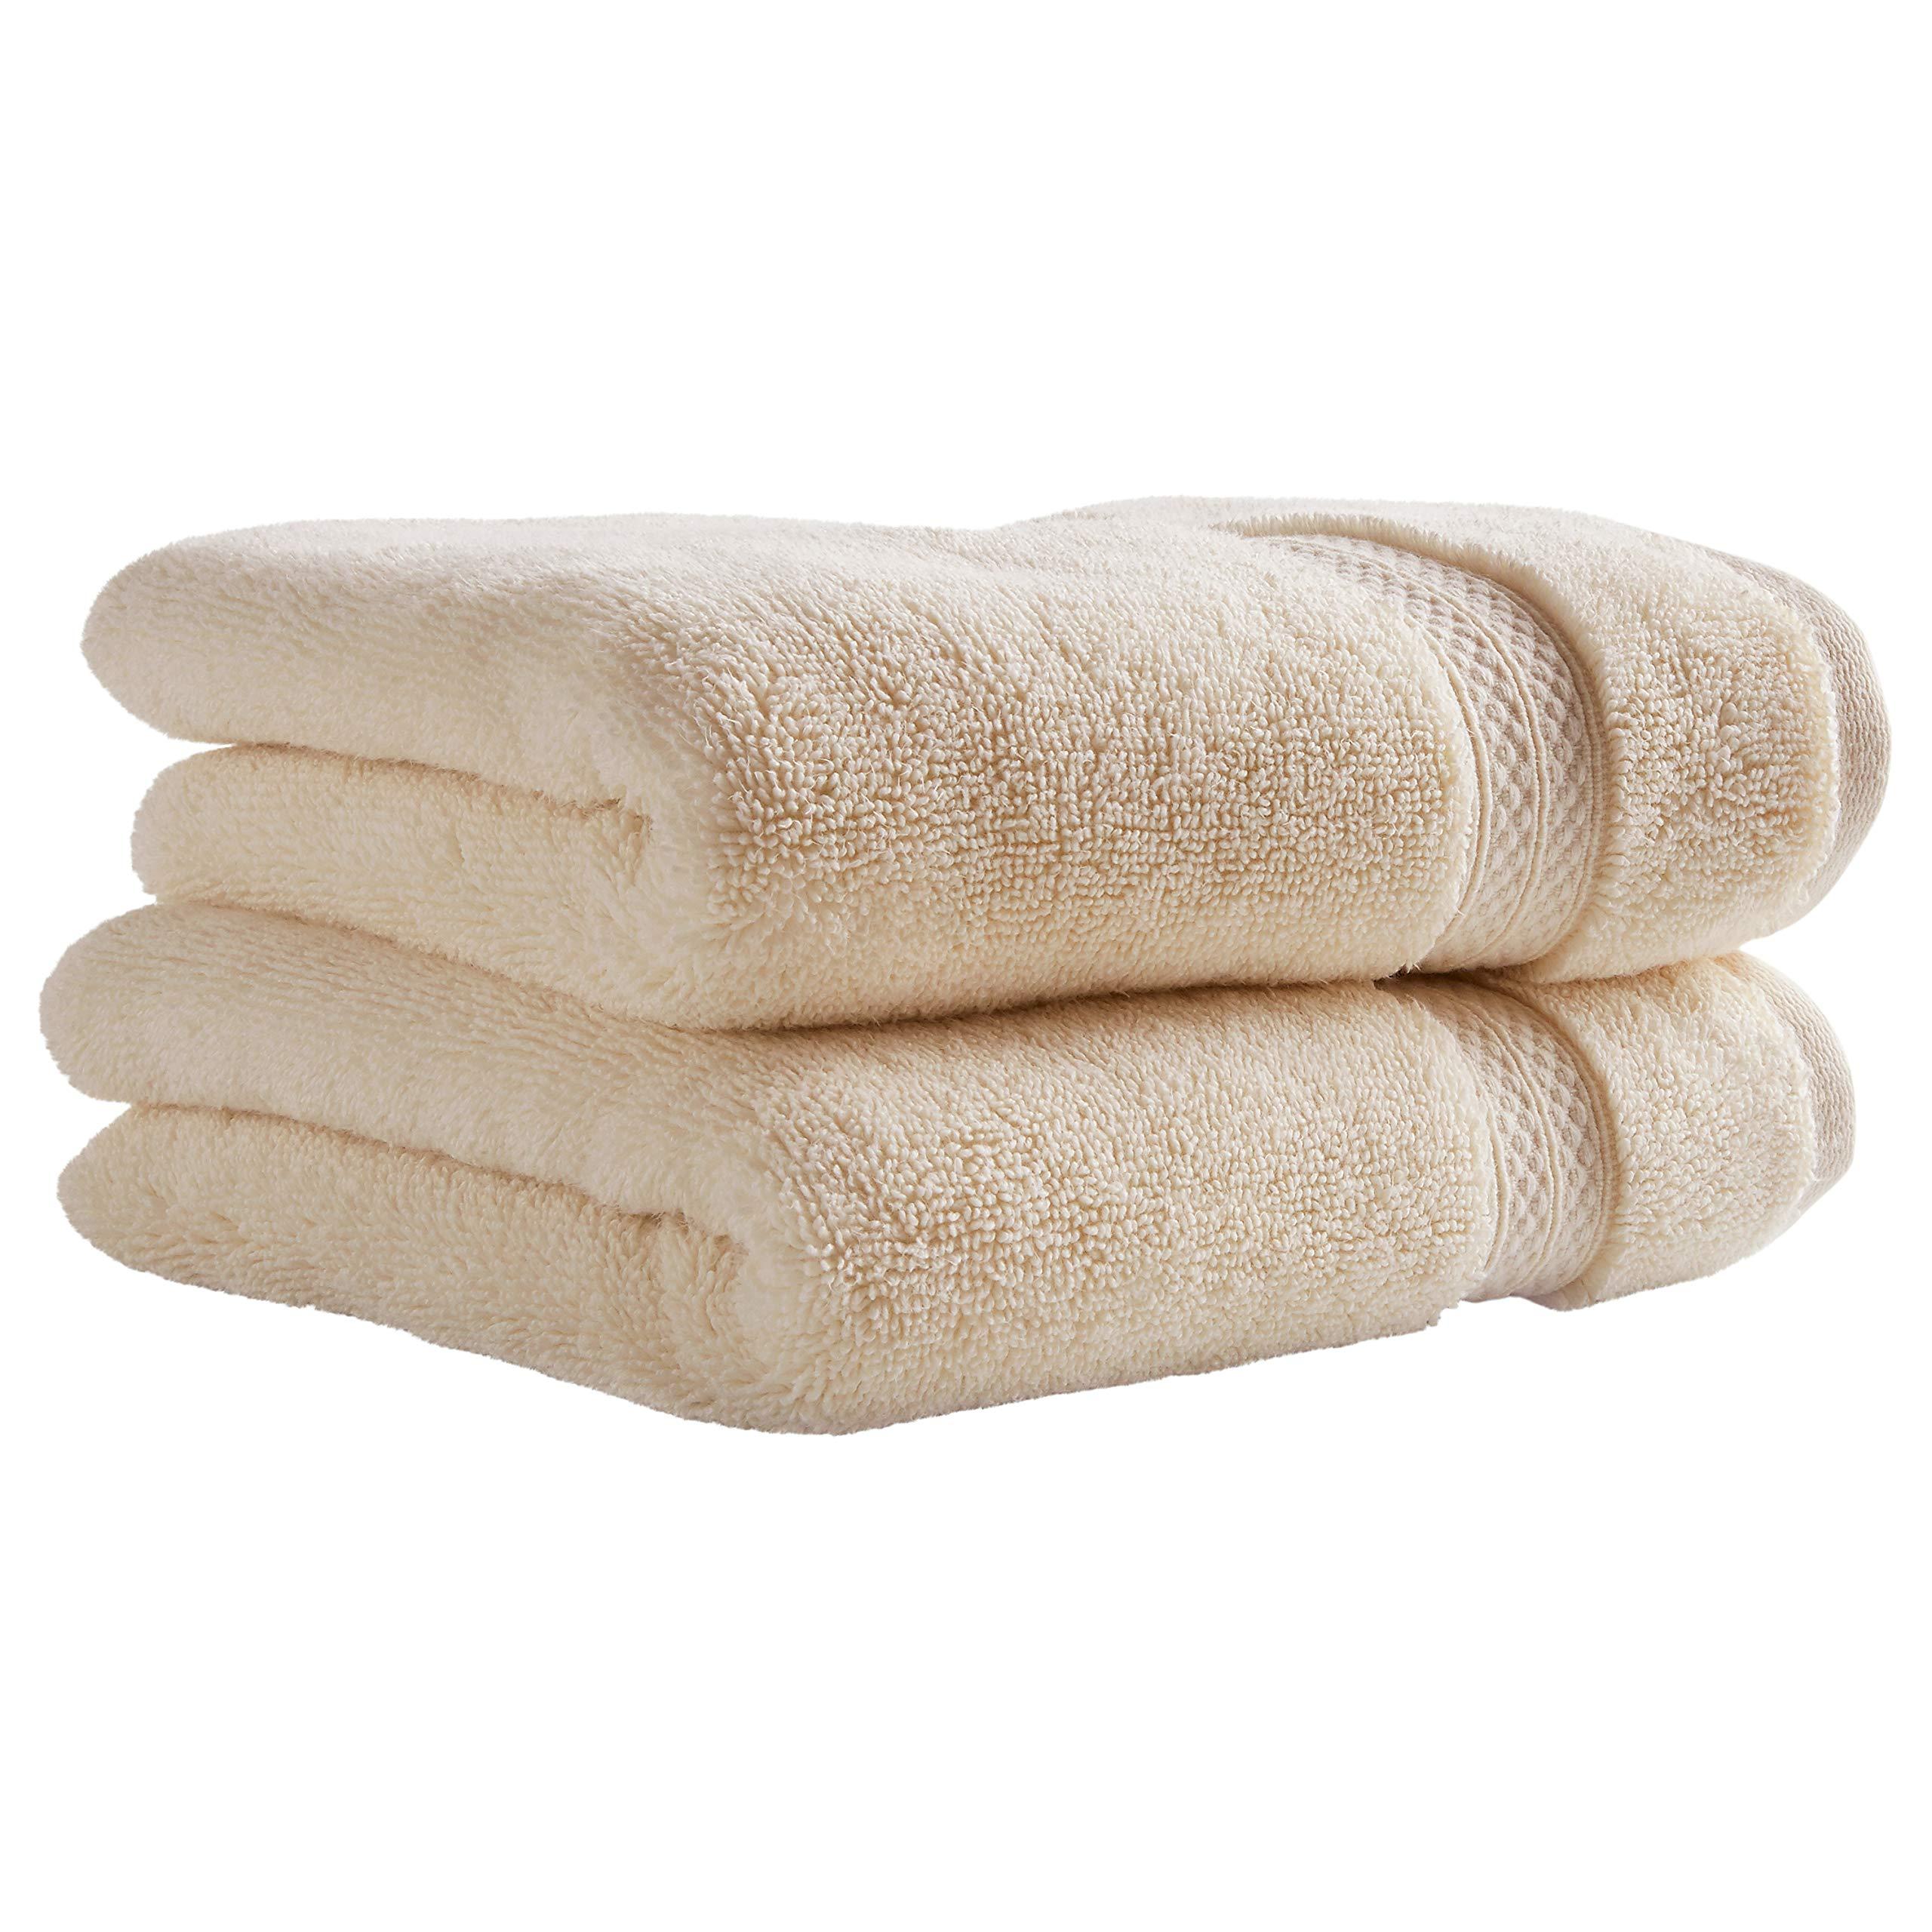 Stone & Beam Heavyweight Turkish Cotton Hand Towels, Set of 2, Ivory